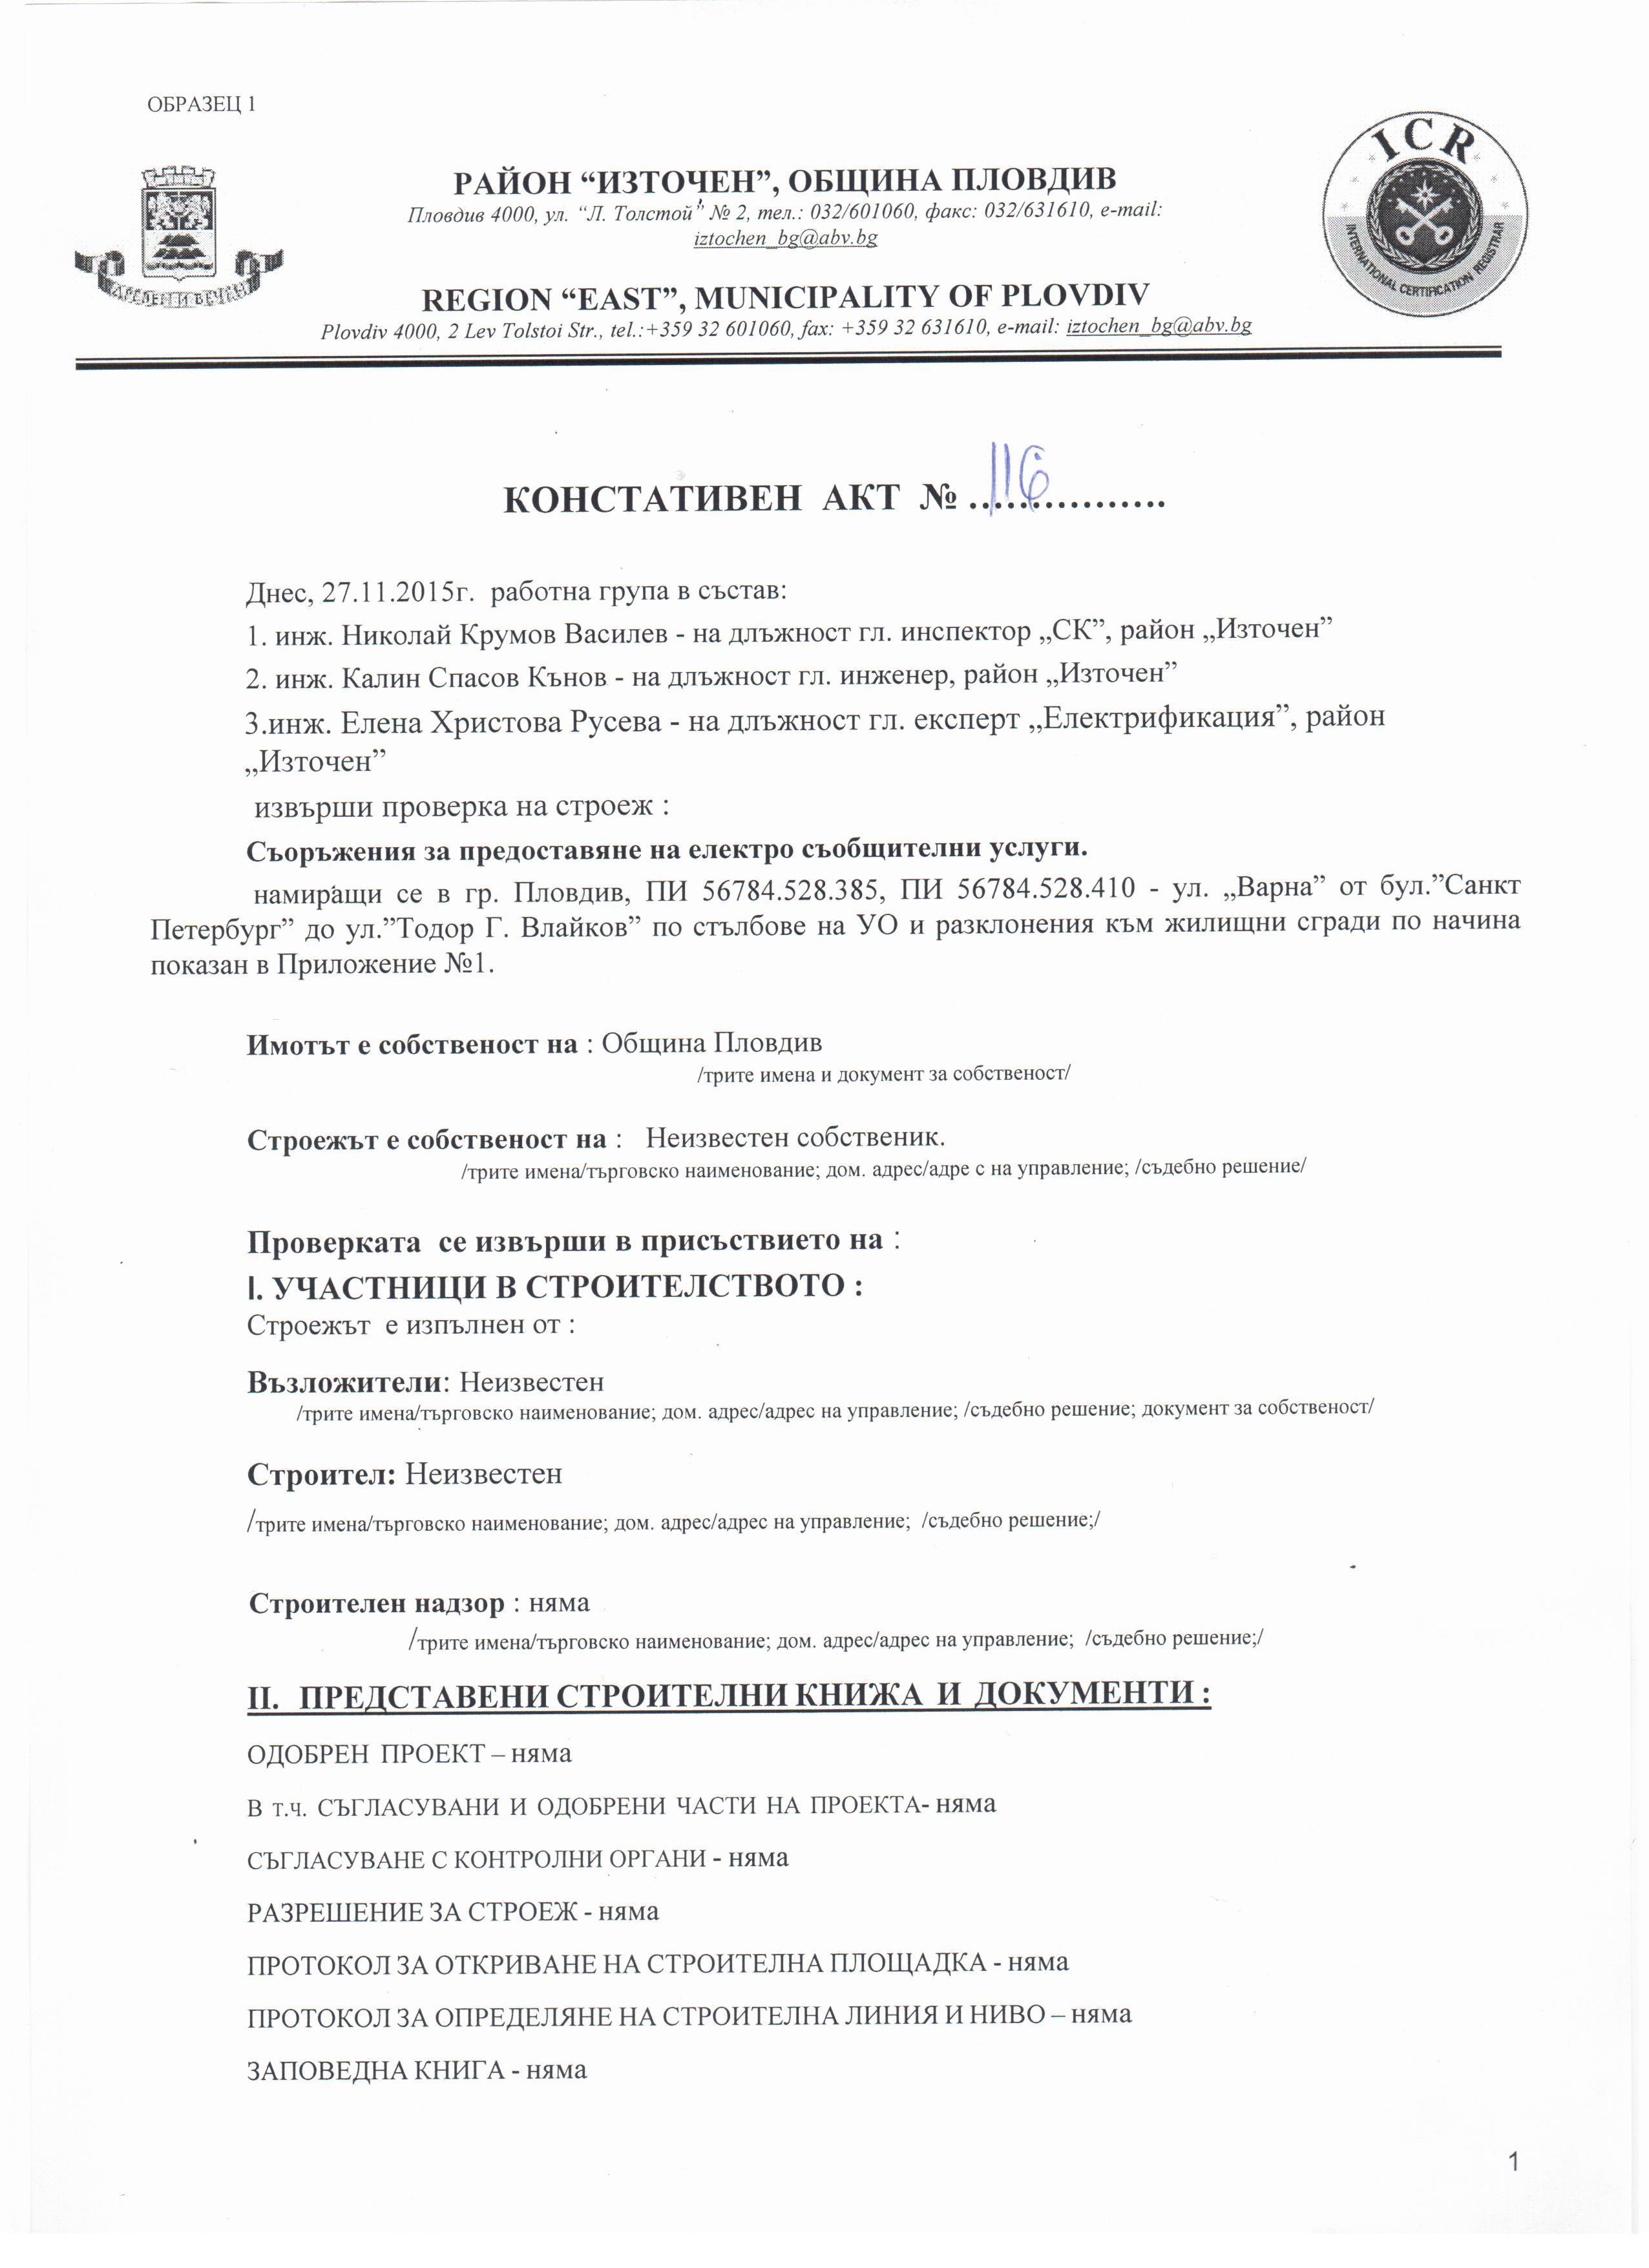 KONSTATIVEN_AKT_№116